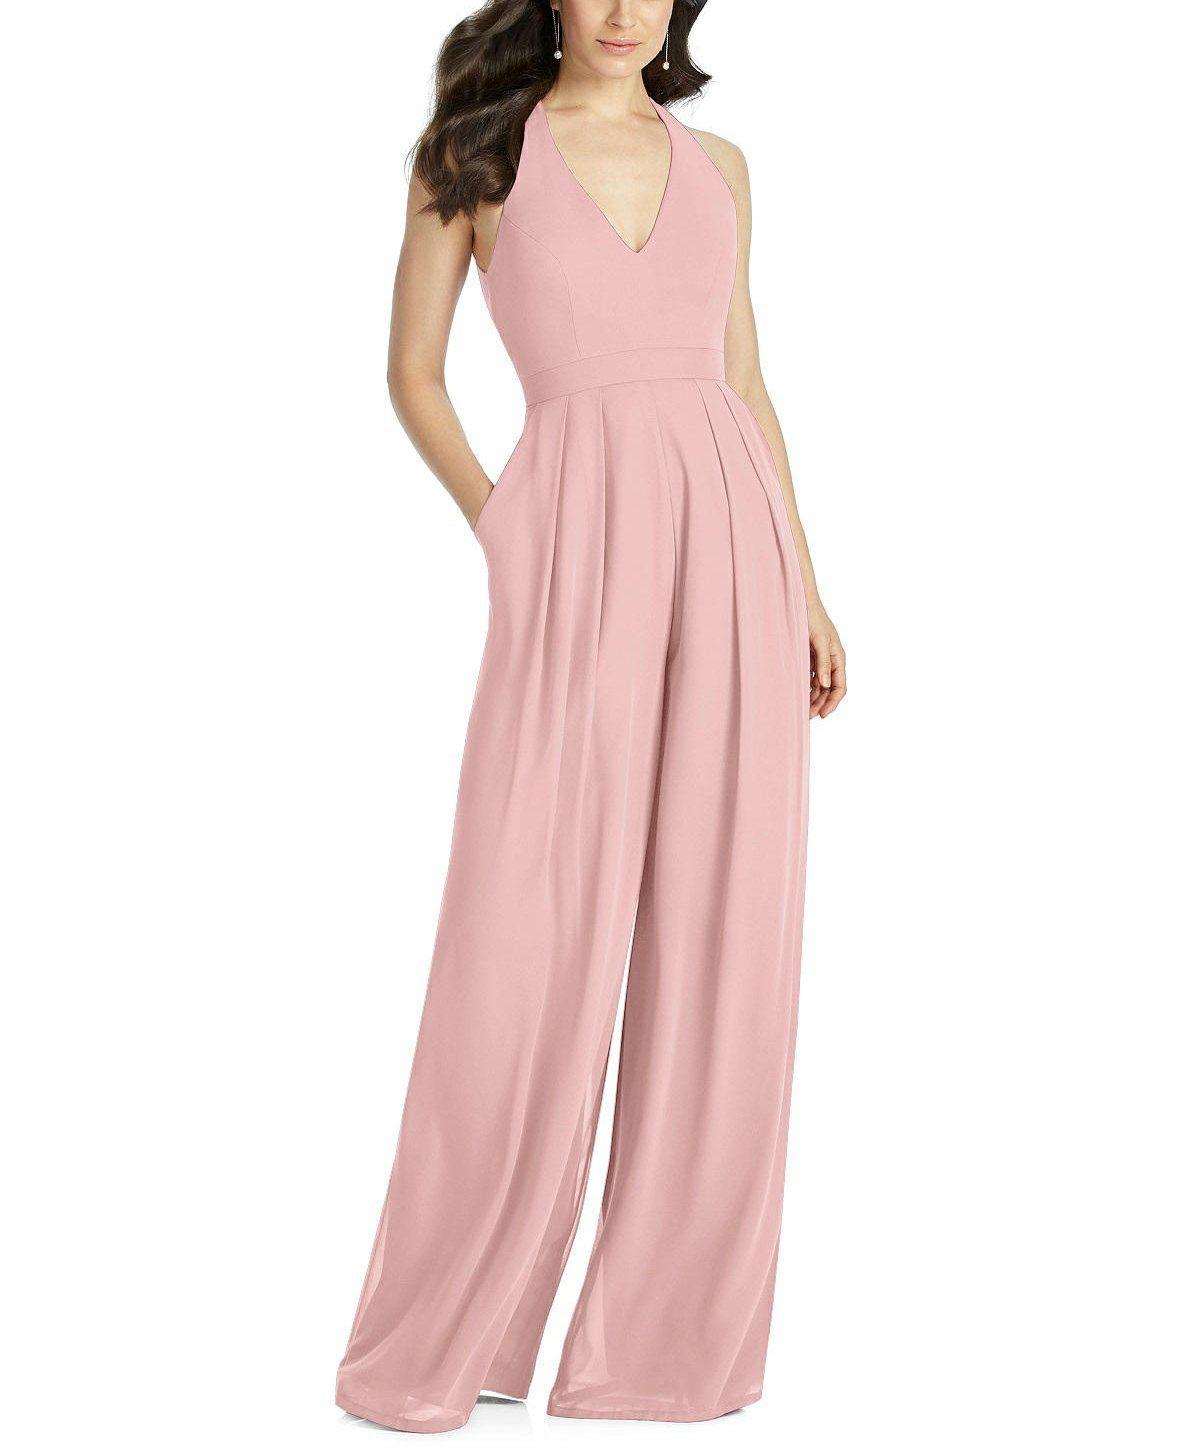 Dessy Bridesmaid Jumpsuit Arielle #bridesmaidjumpsuits